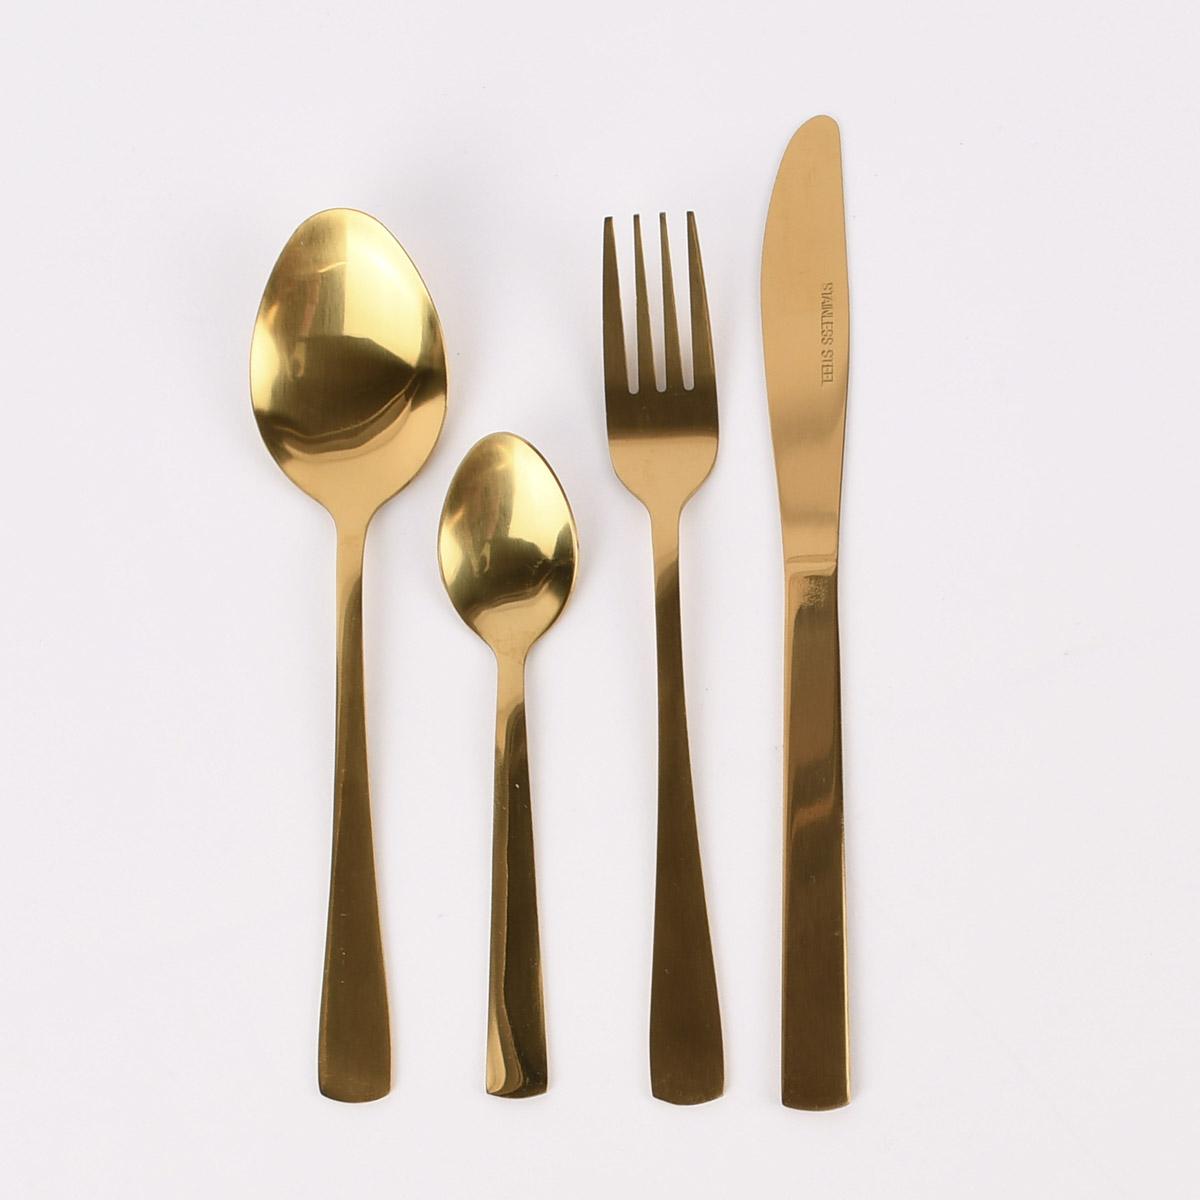 Besteck-Set Dinnerbesteck goldfarbig 16teilig